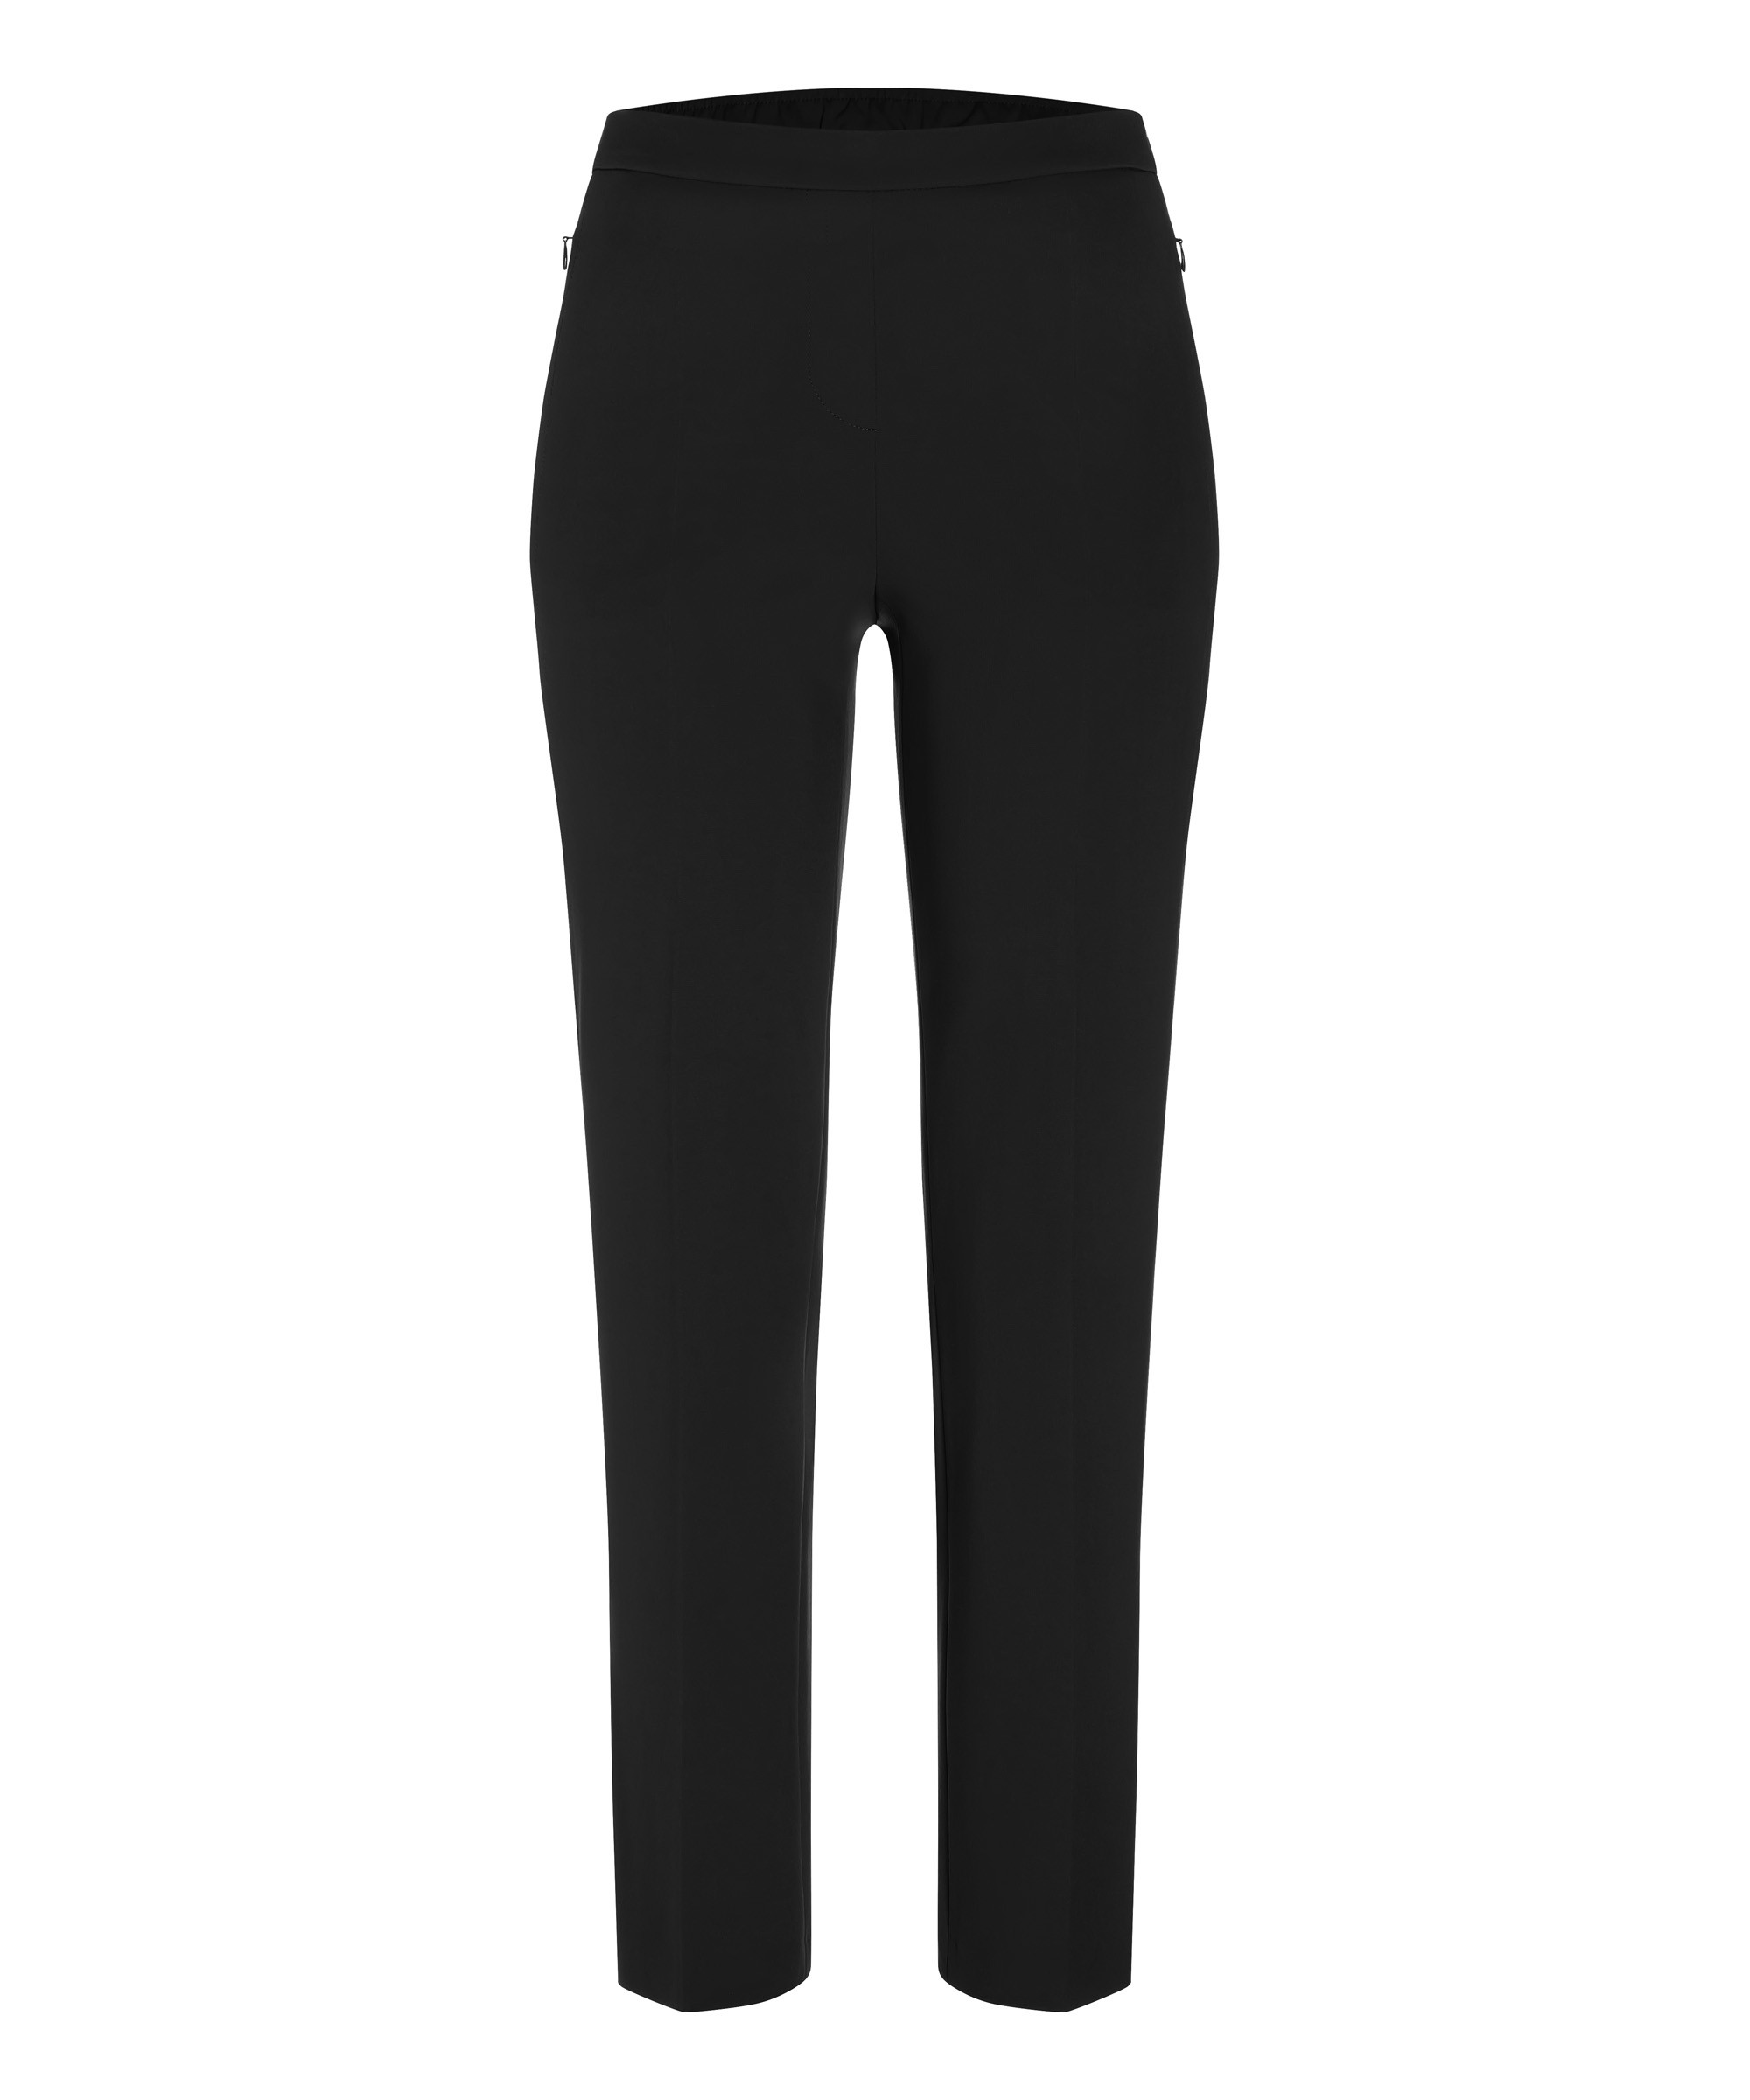 Cambio bukser